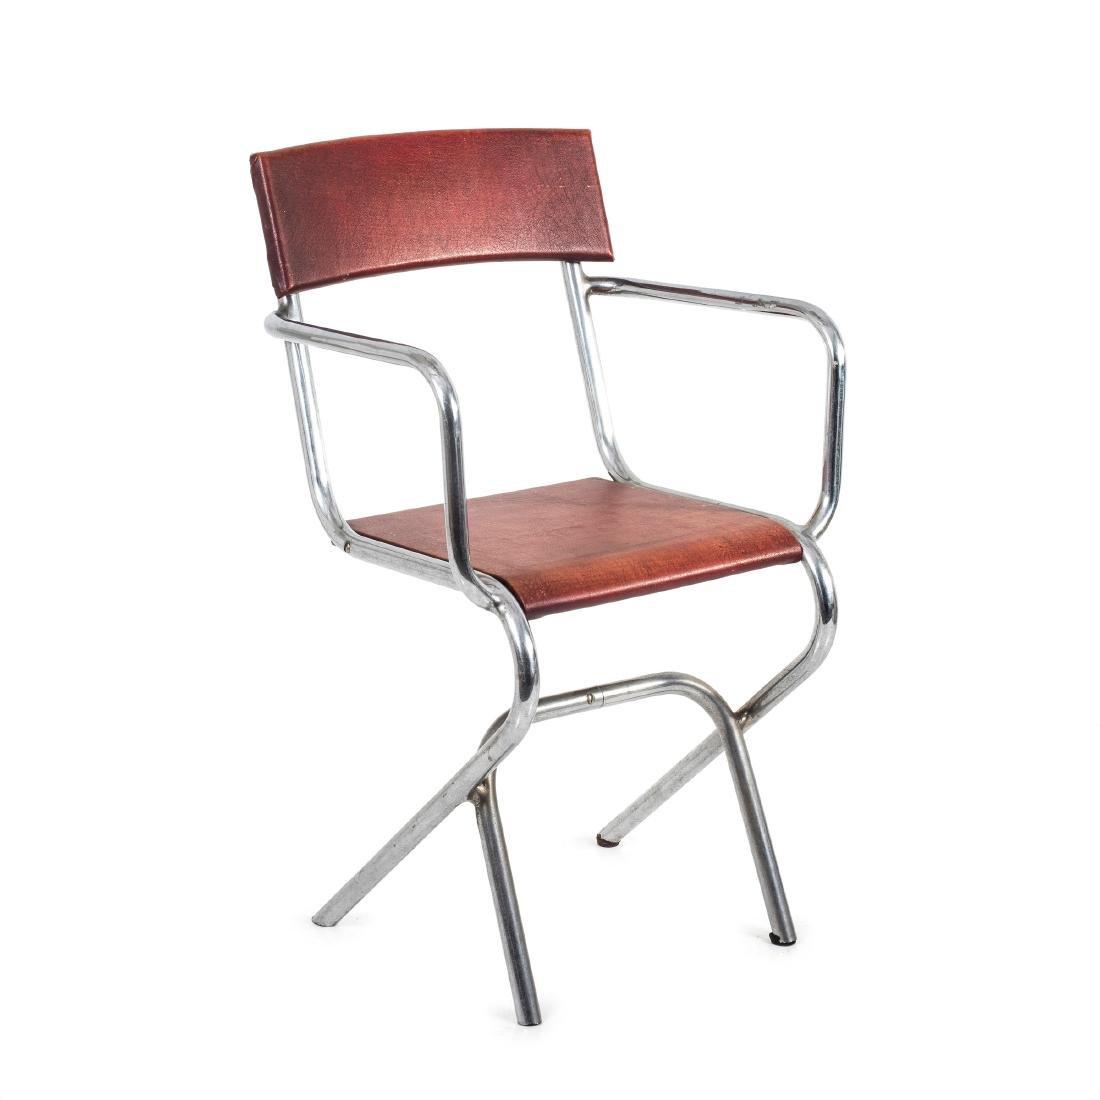 Tubular steel chair, 1939